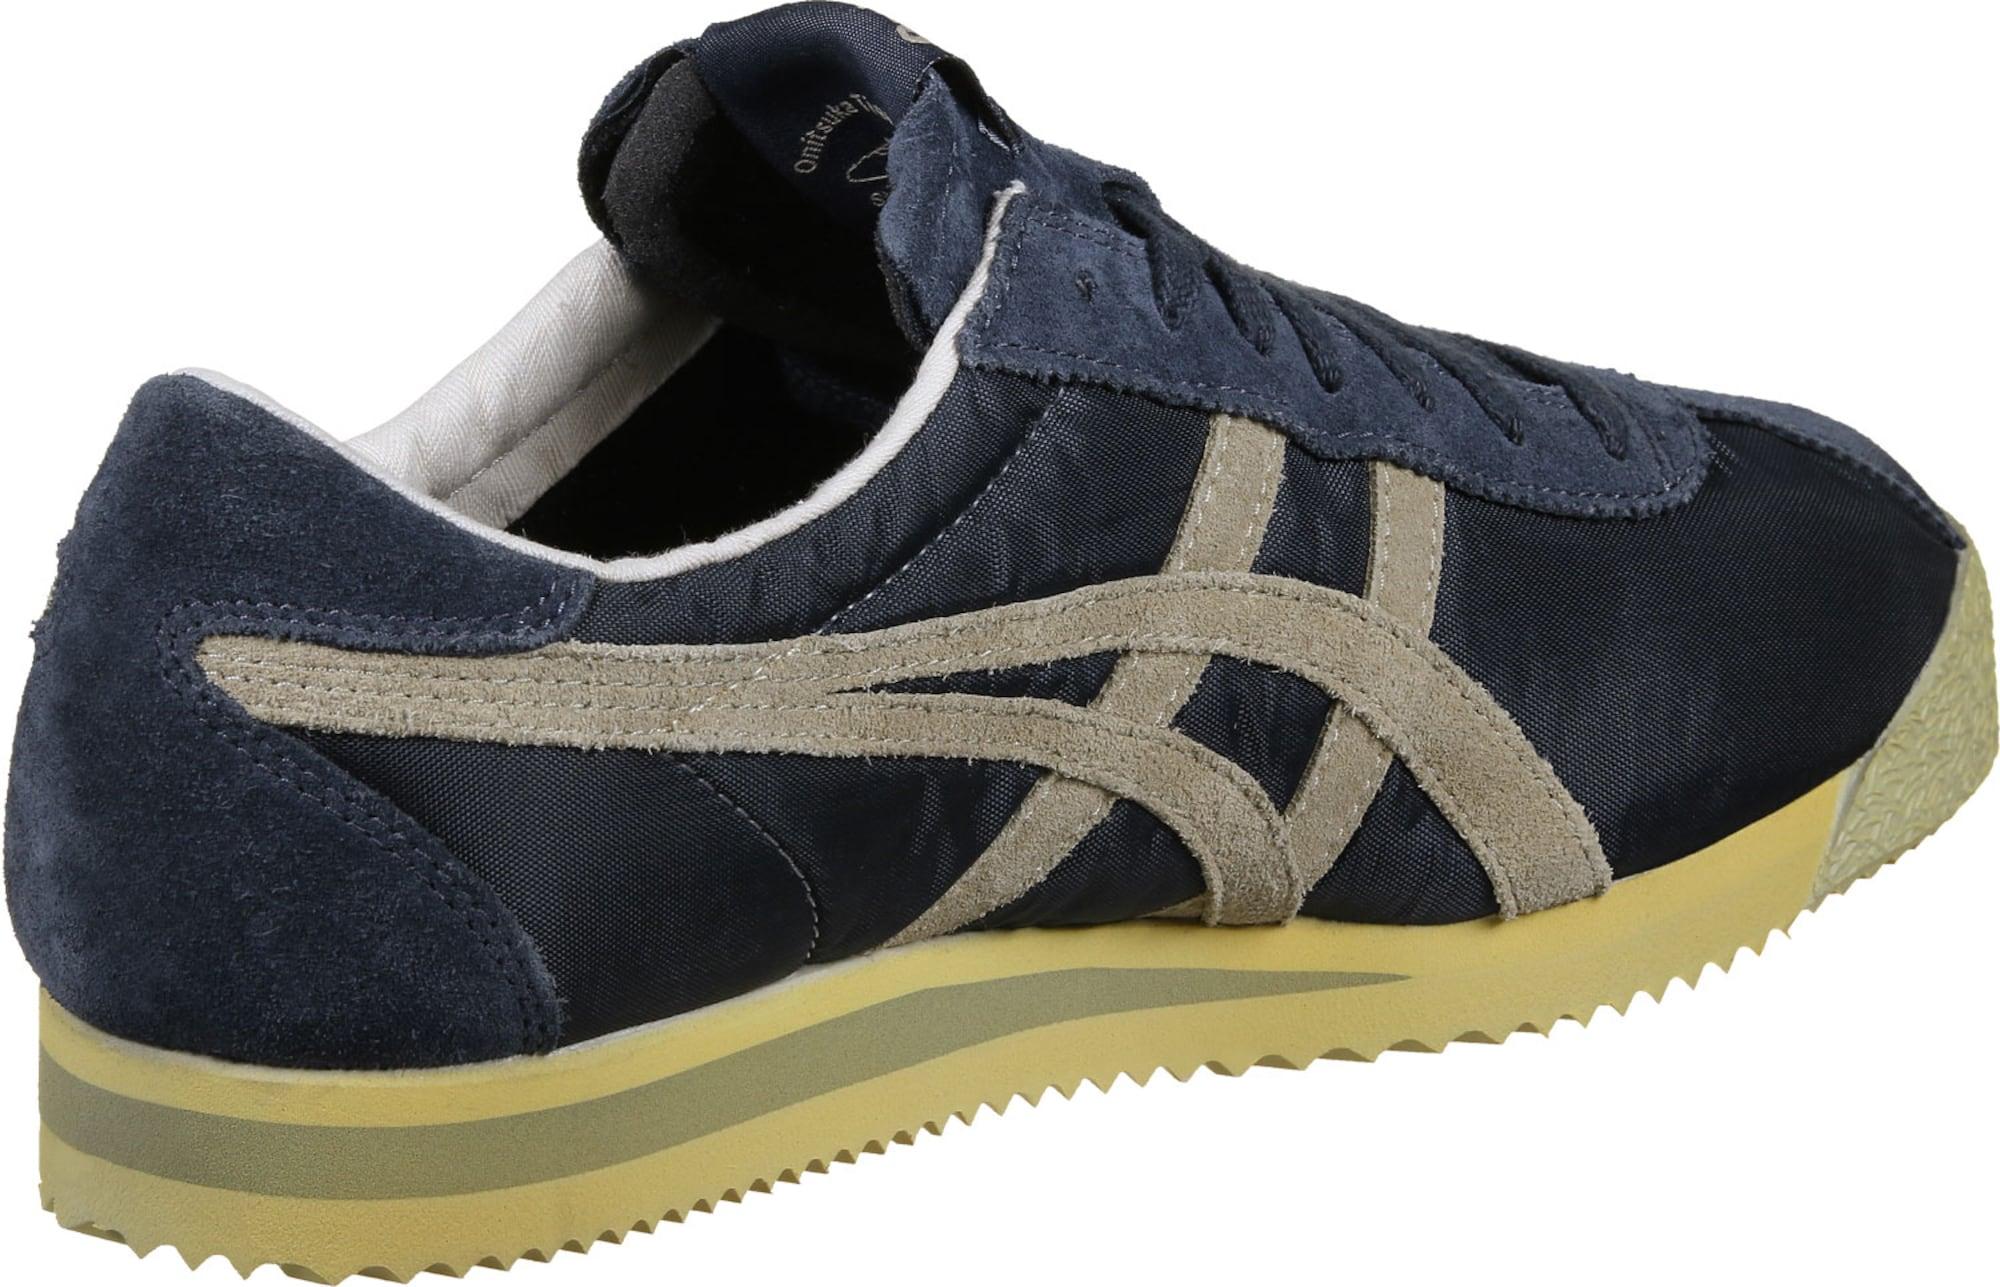 on sale 6f9b6 acb8b AboutYou   Herren Onitsuka Tiger Onitsuka Tiger Sneaker ...